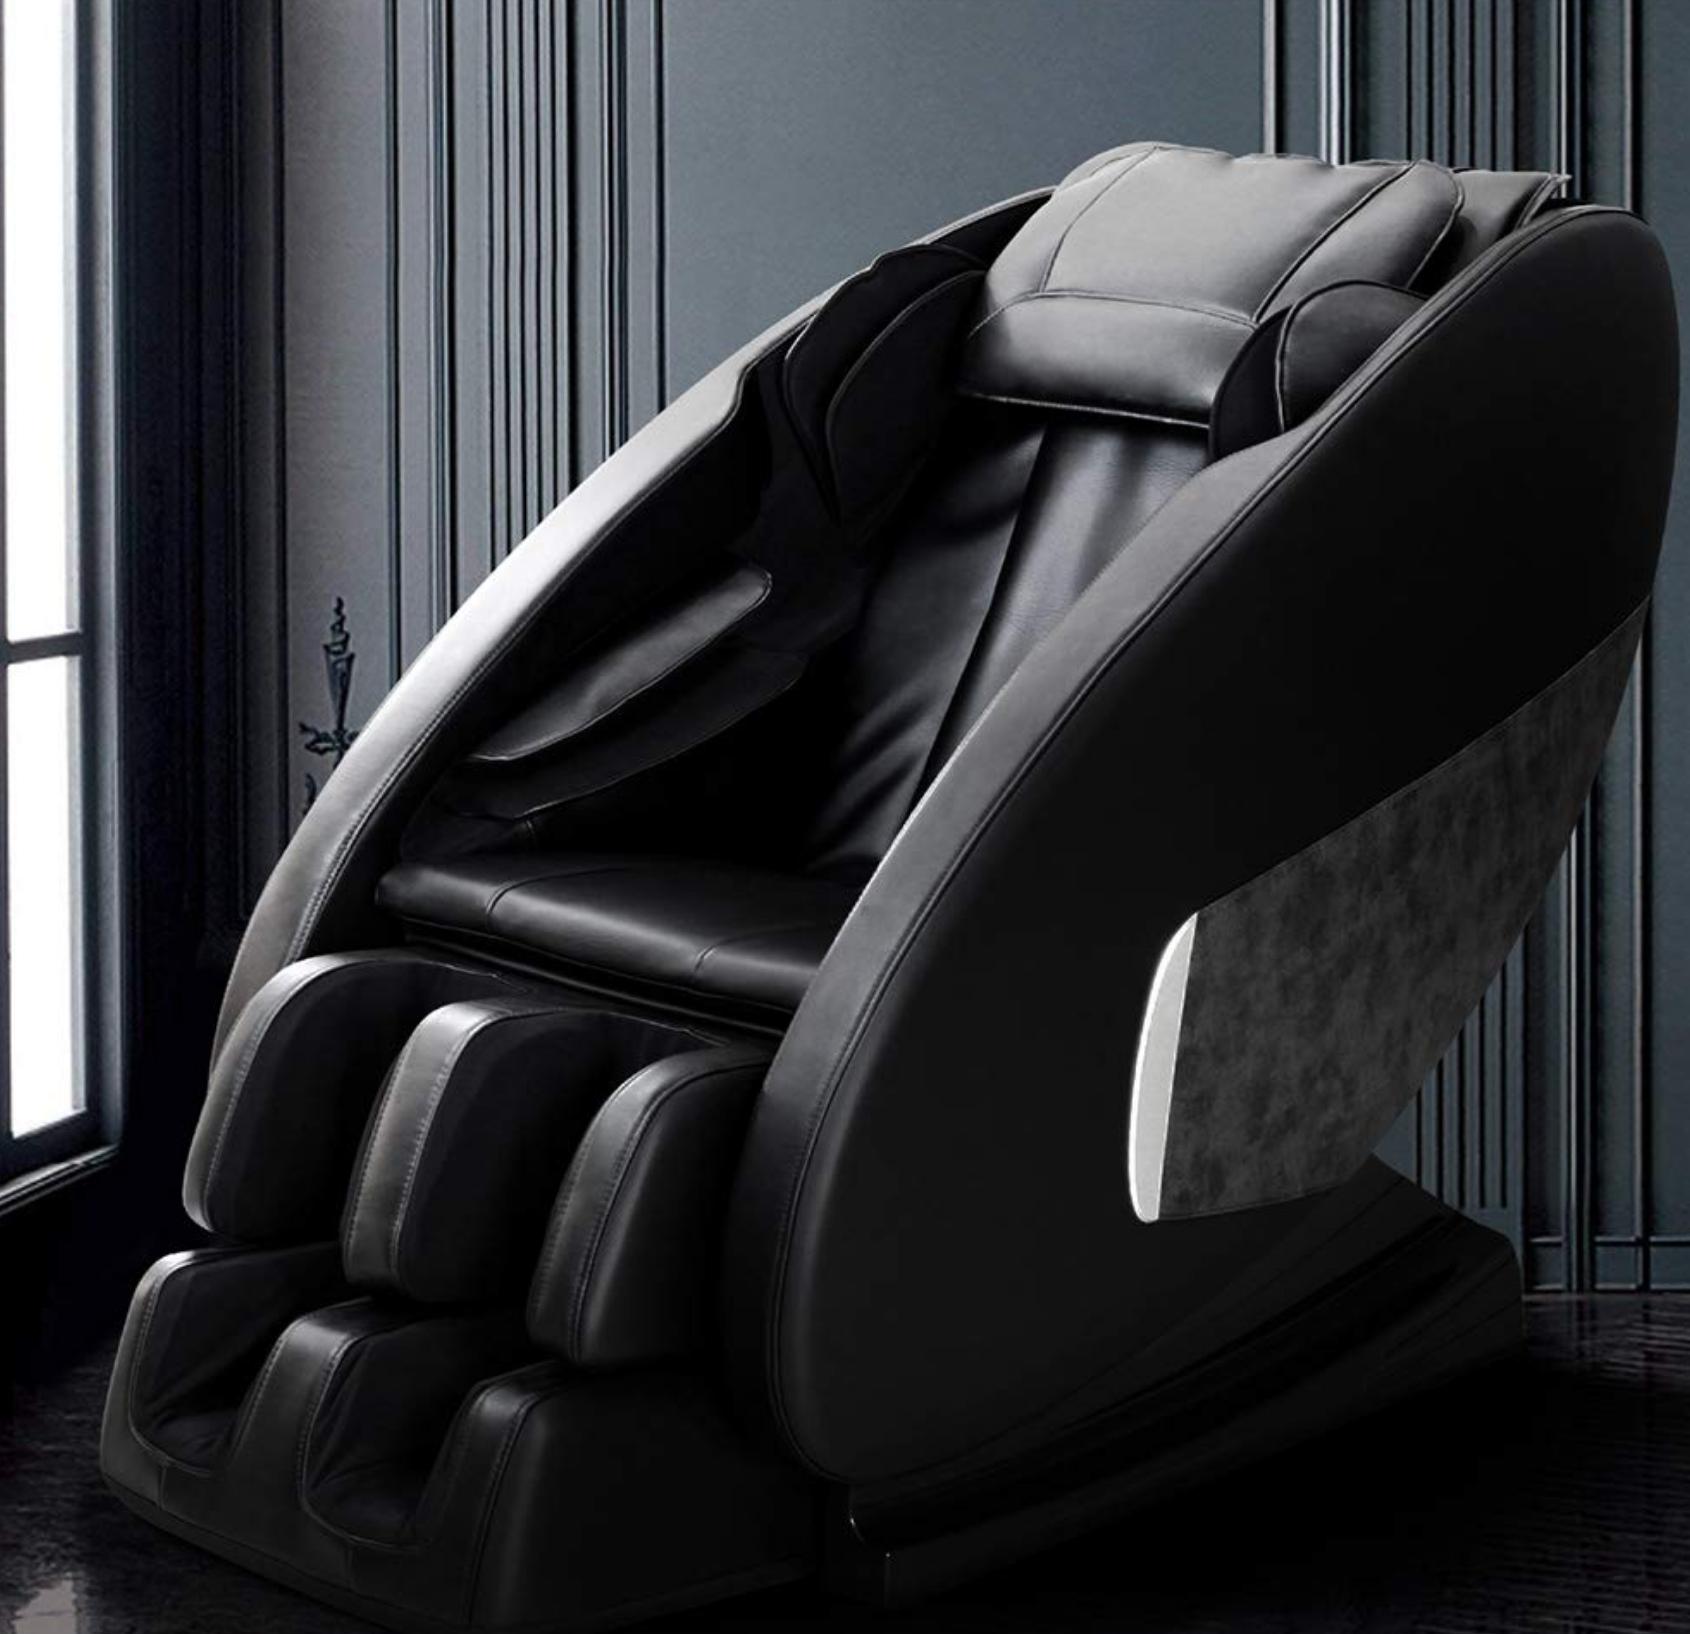 Massage chair rental in Milwaukee, Waukesha, Madison, Green Bay, Appleton, and Mequon Wisconsin.